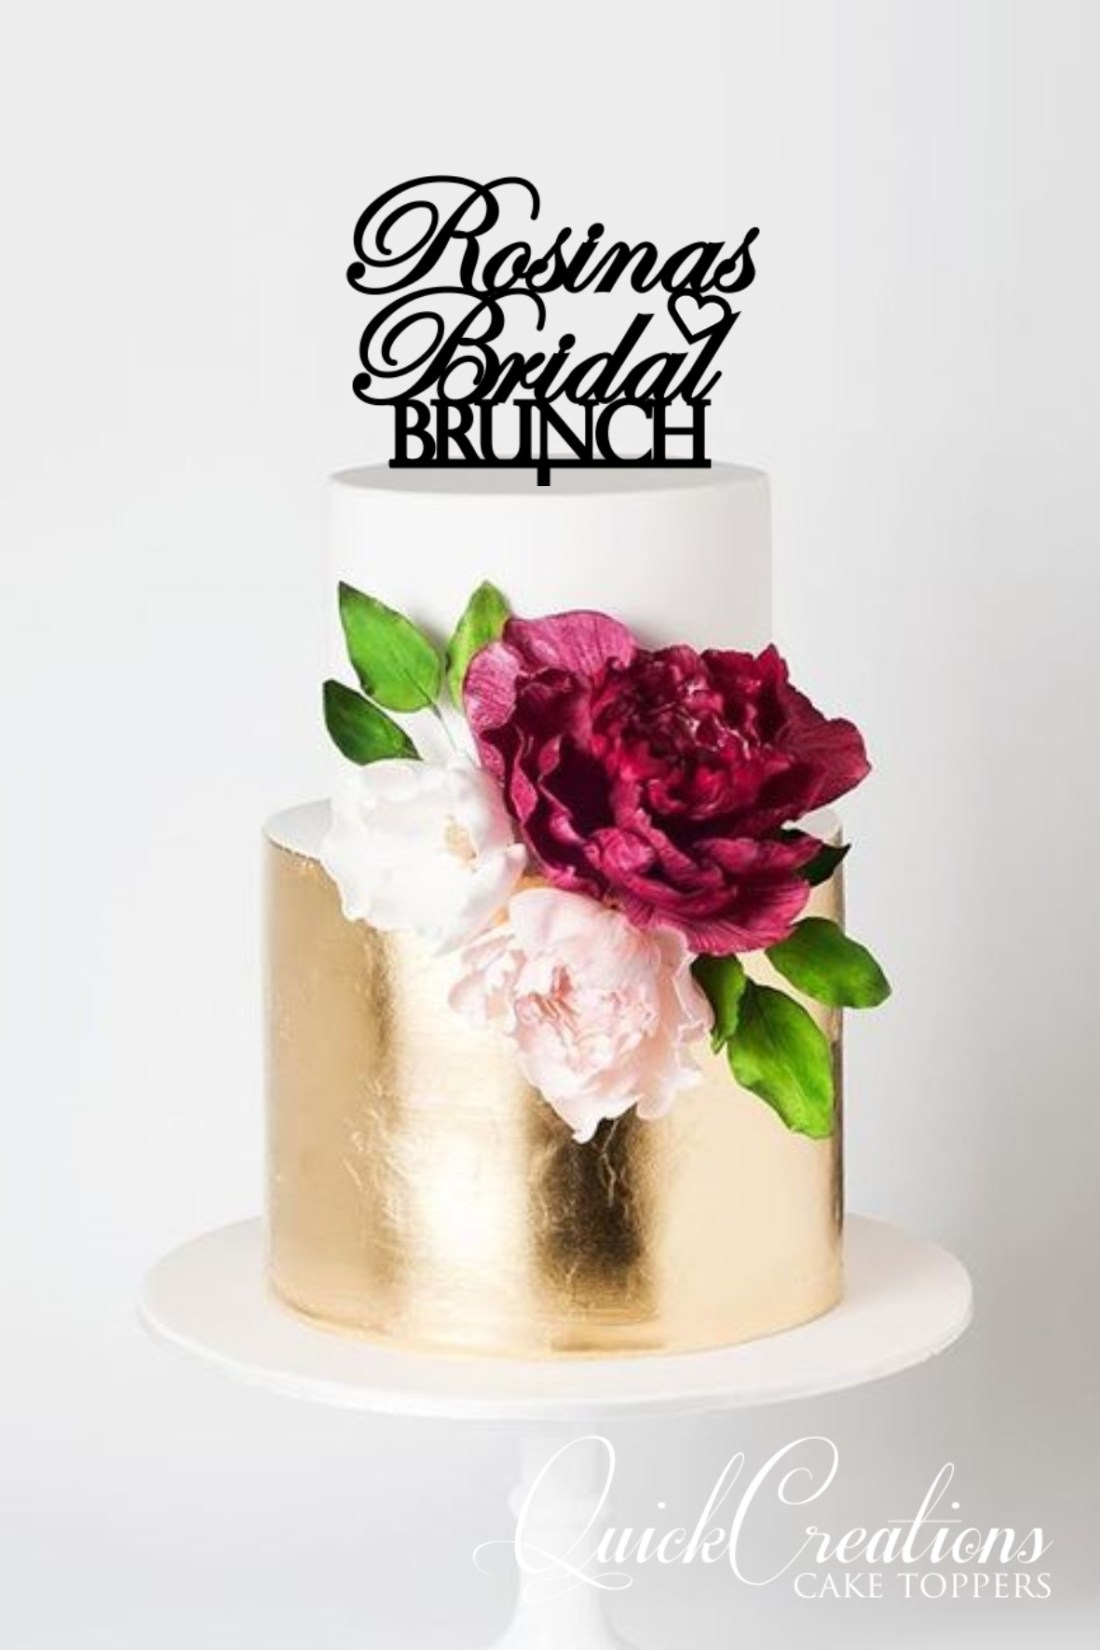 Quick Creations Cake Topper - Rosina's Bridal Brunch